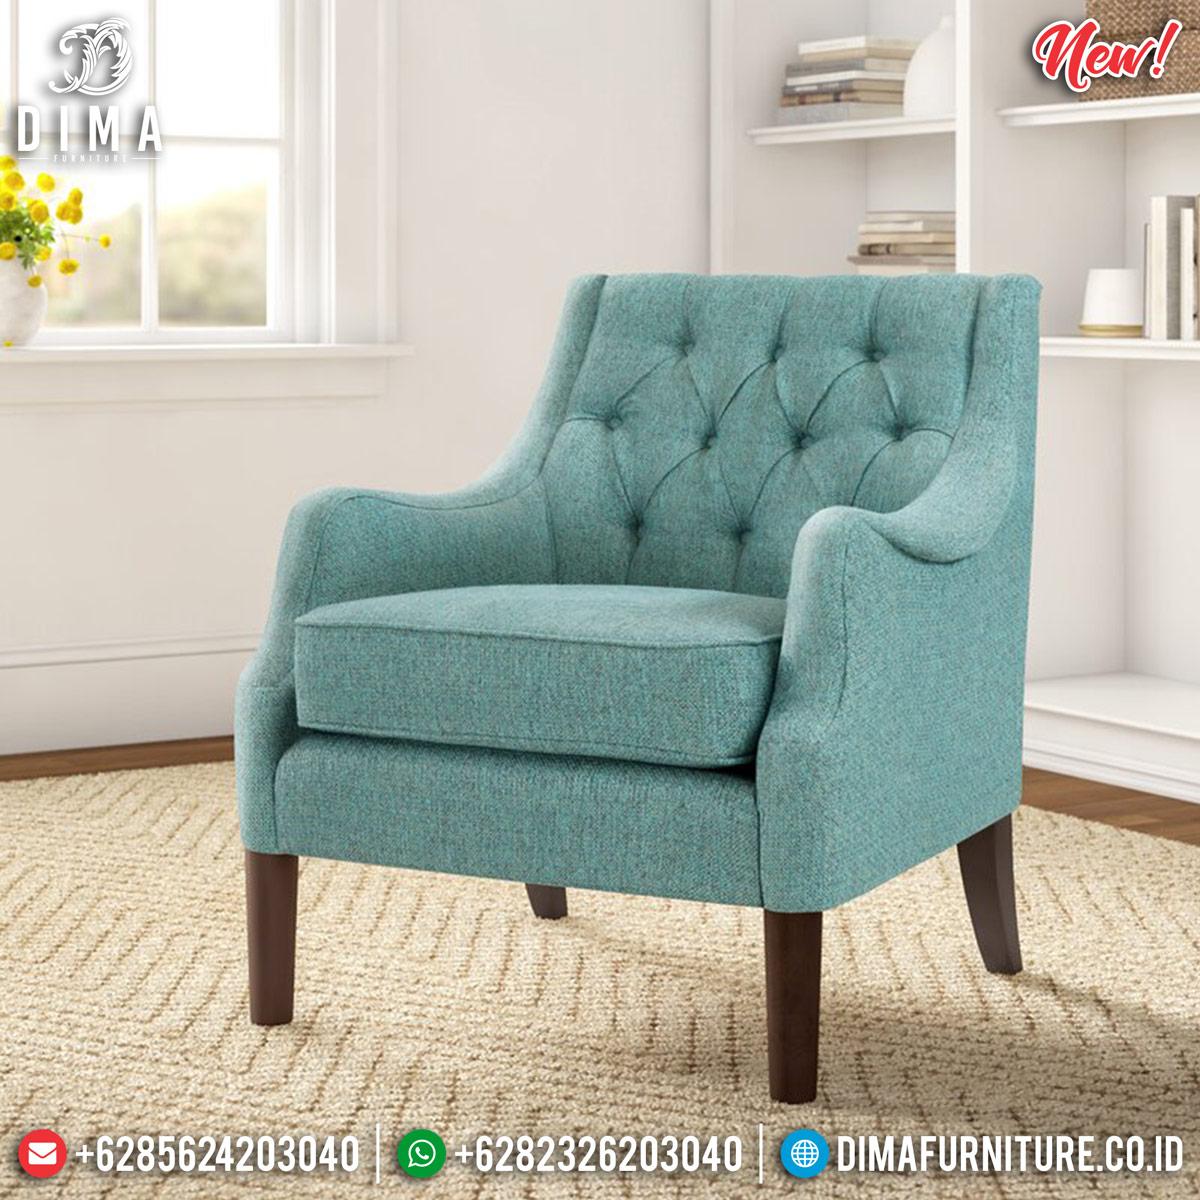 Epic Desain Sofa Minimalis Single Seater New Luxury Furniture Jepara MMJ-0818